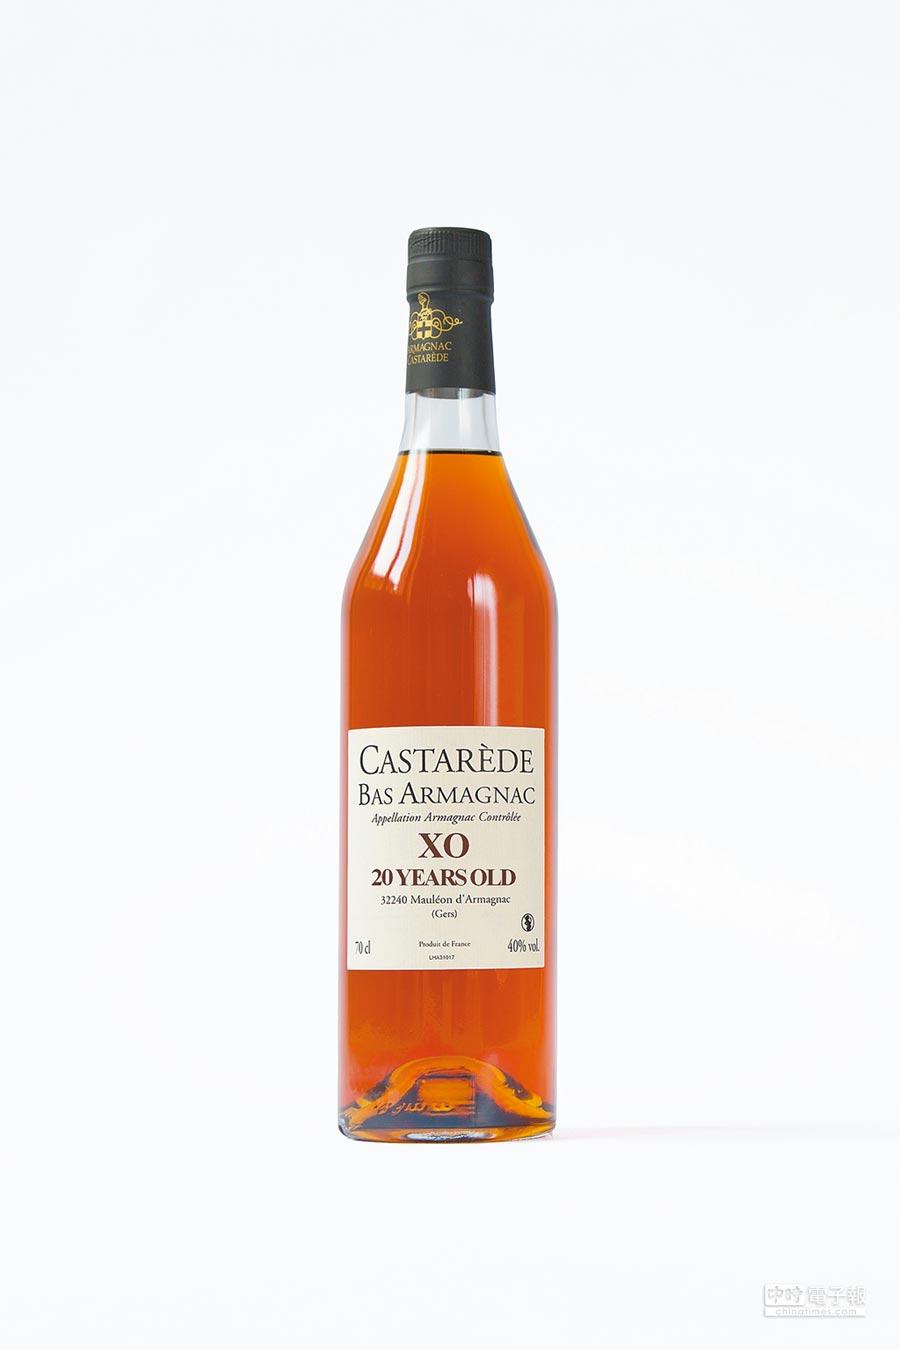 Castarede是非常古老的雅馬邑家族品牌,成熟圓潤是其最大特色,年輕的VSOP便已優秀,XO則含至少20年的陳酒,同時更以出色的年分酒聞名。圖片提供各品牌